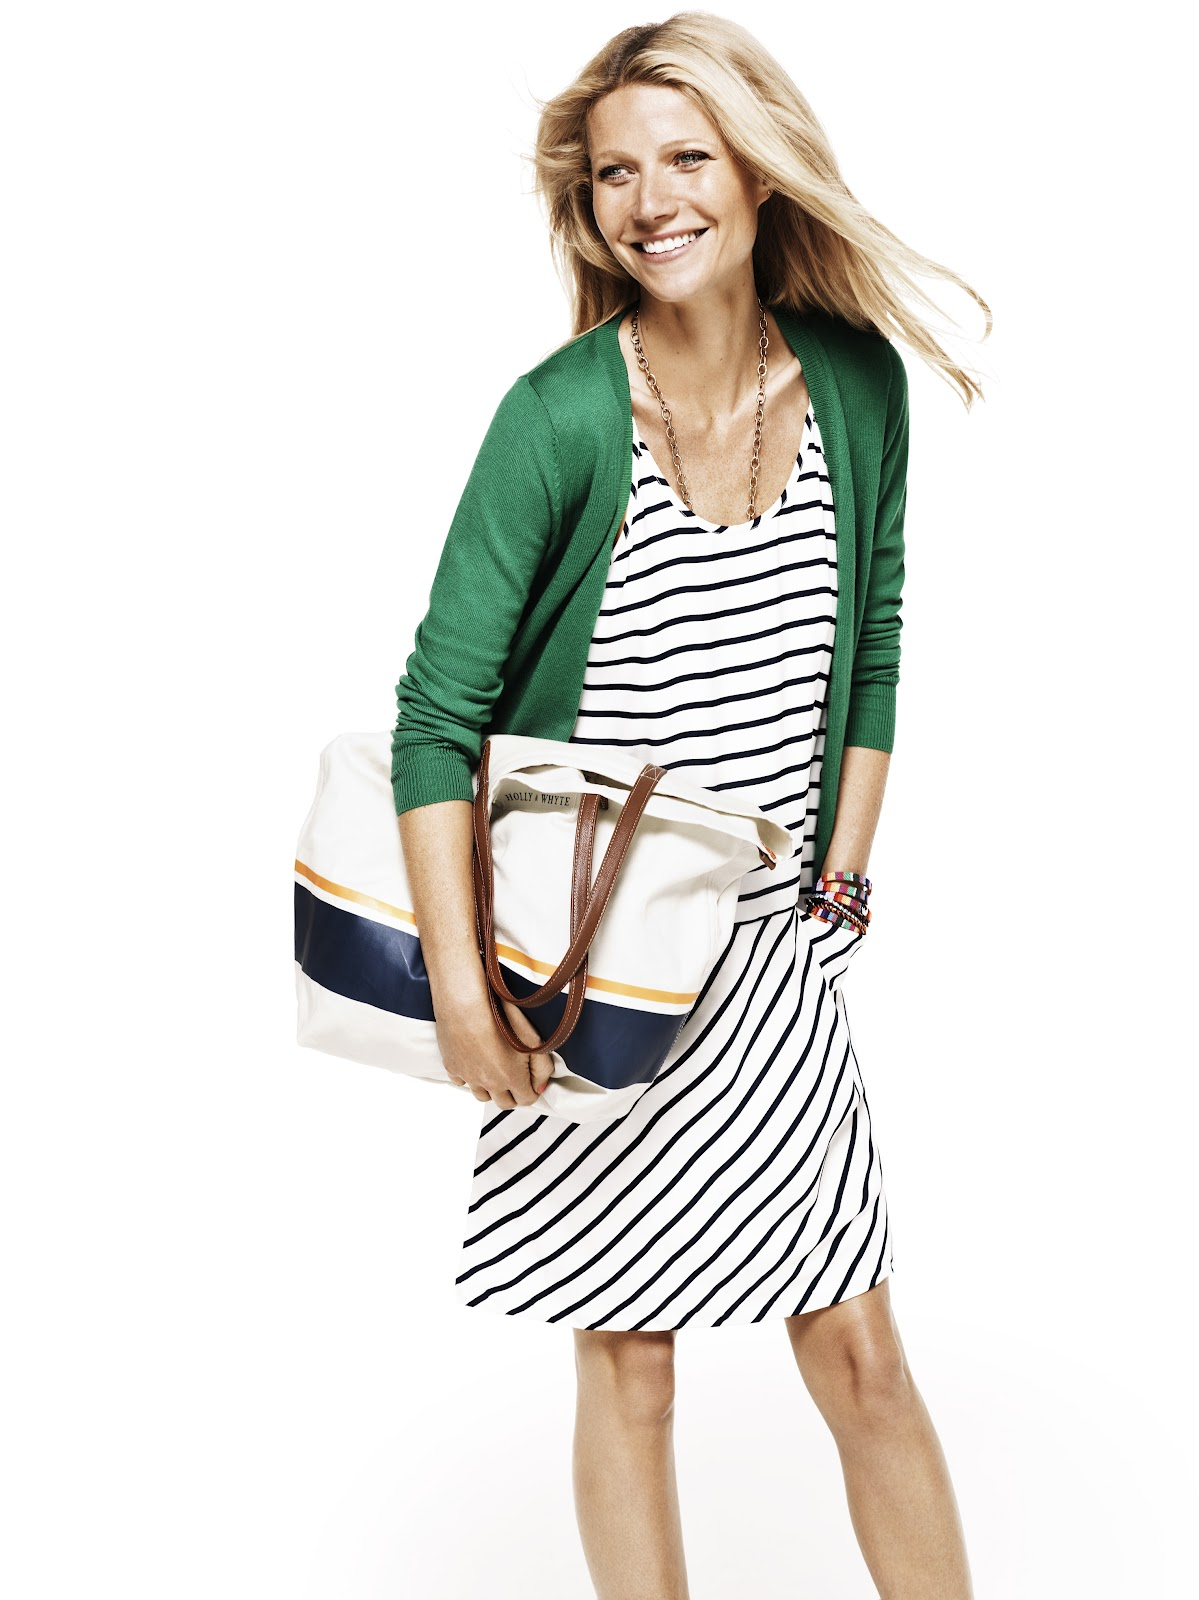 http://1.bp.blogspot.com/-6Nbku7qLl0E/T2WI-HvEk9I/AAAAAAAAELw/byuKkFkySwk/s1600/lindex+gwyneth+h.jpg